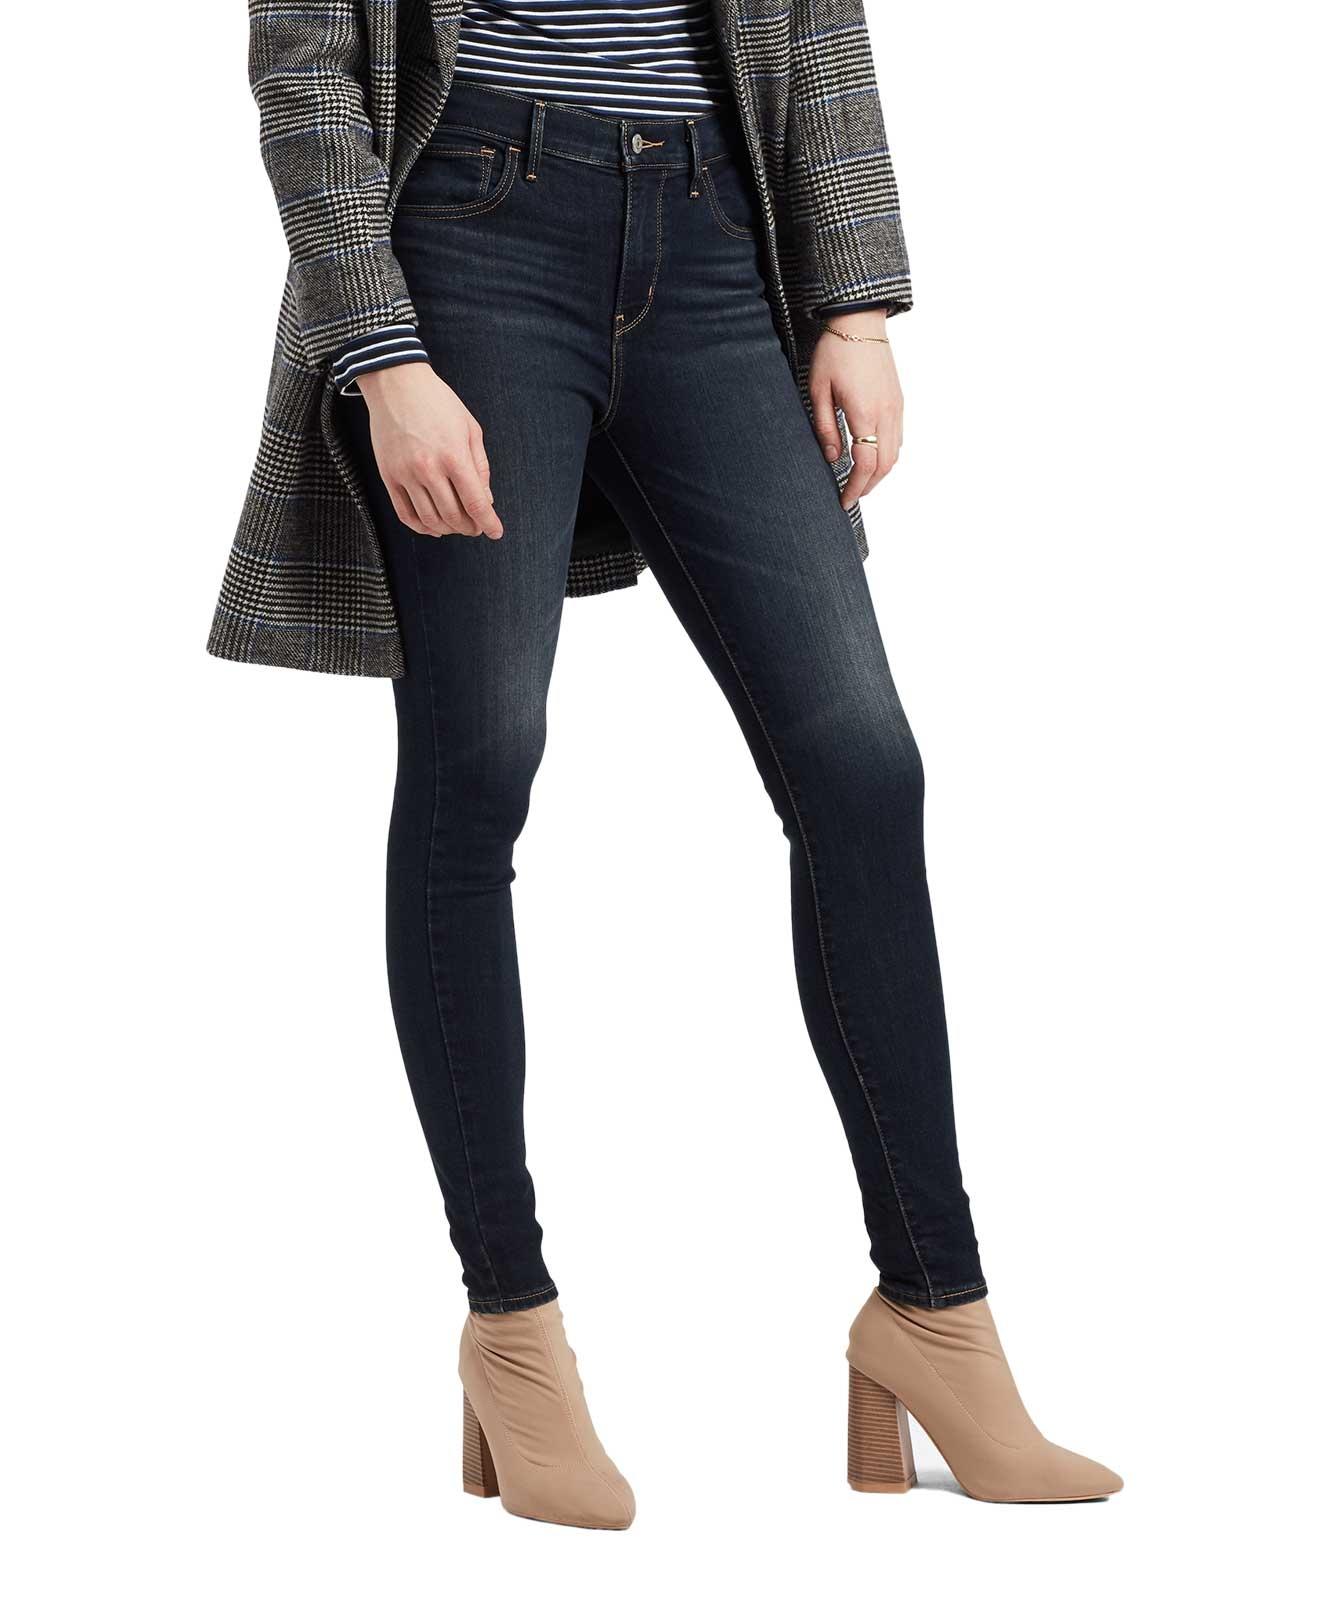 Hosen für Frauen - Levis 720 High Waisted Super Skinny Jeans  - Onlineshop Jeans Meile